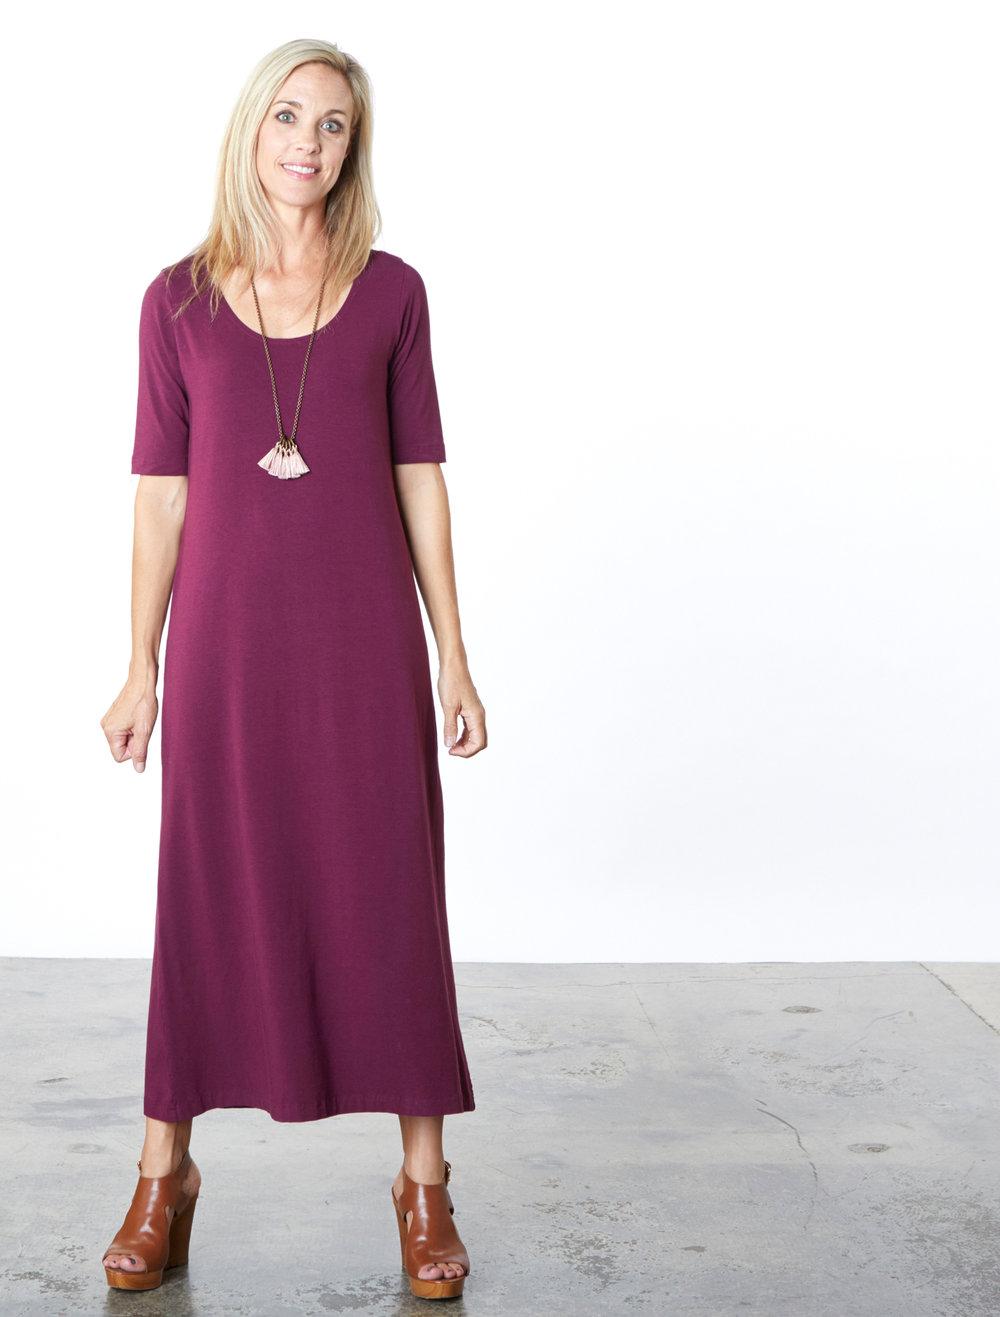 S/S Bobbi Dress in Mangosteen Bamboo Cotton